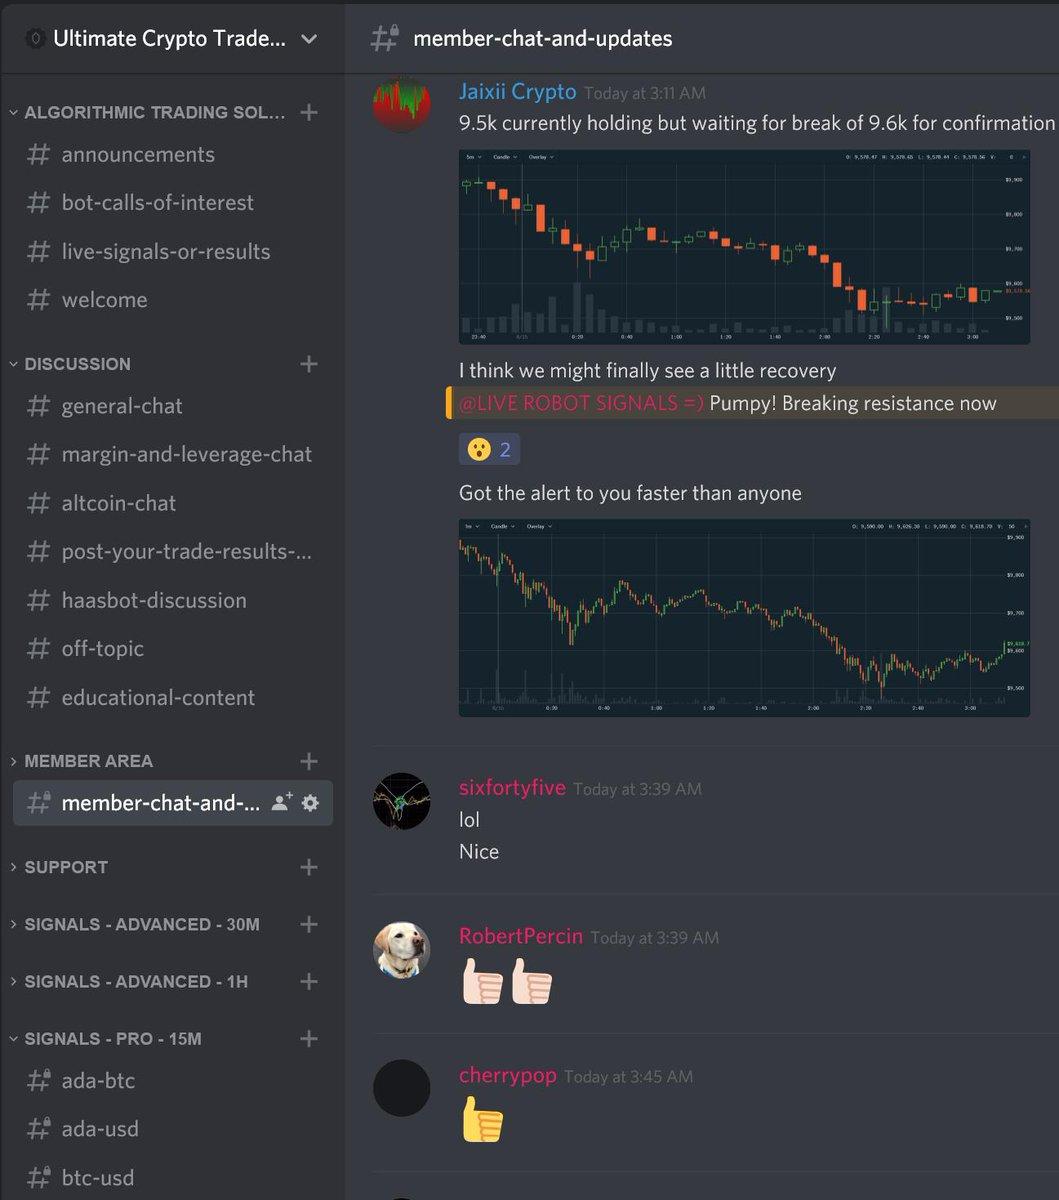 Jaixii Crypto - Algorithmic Trading Solutions on Twitter